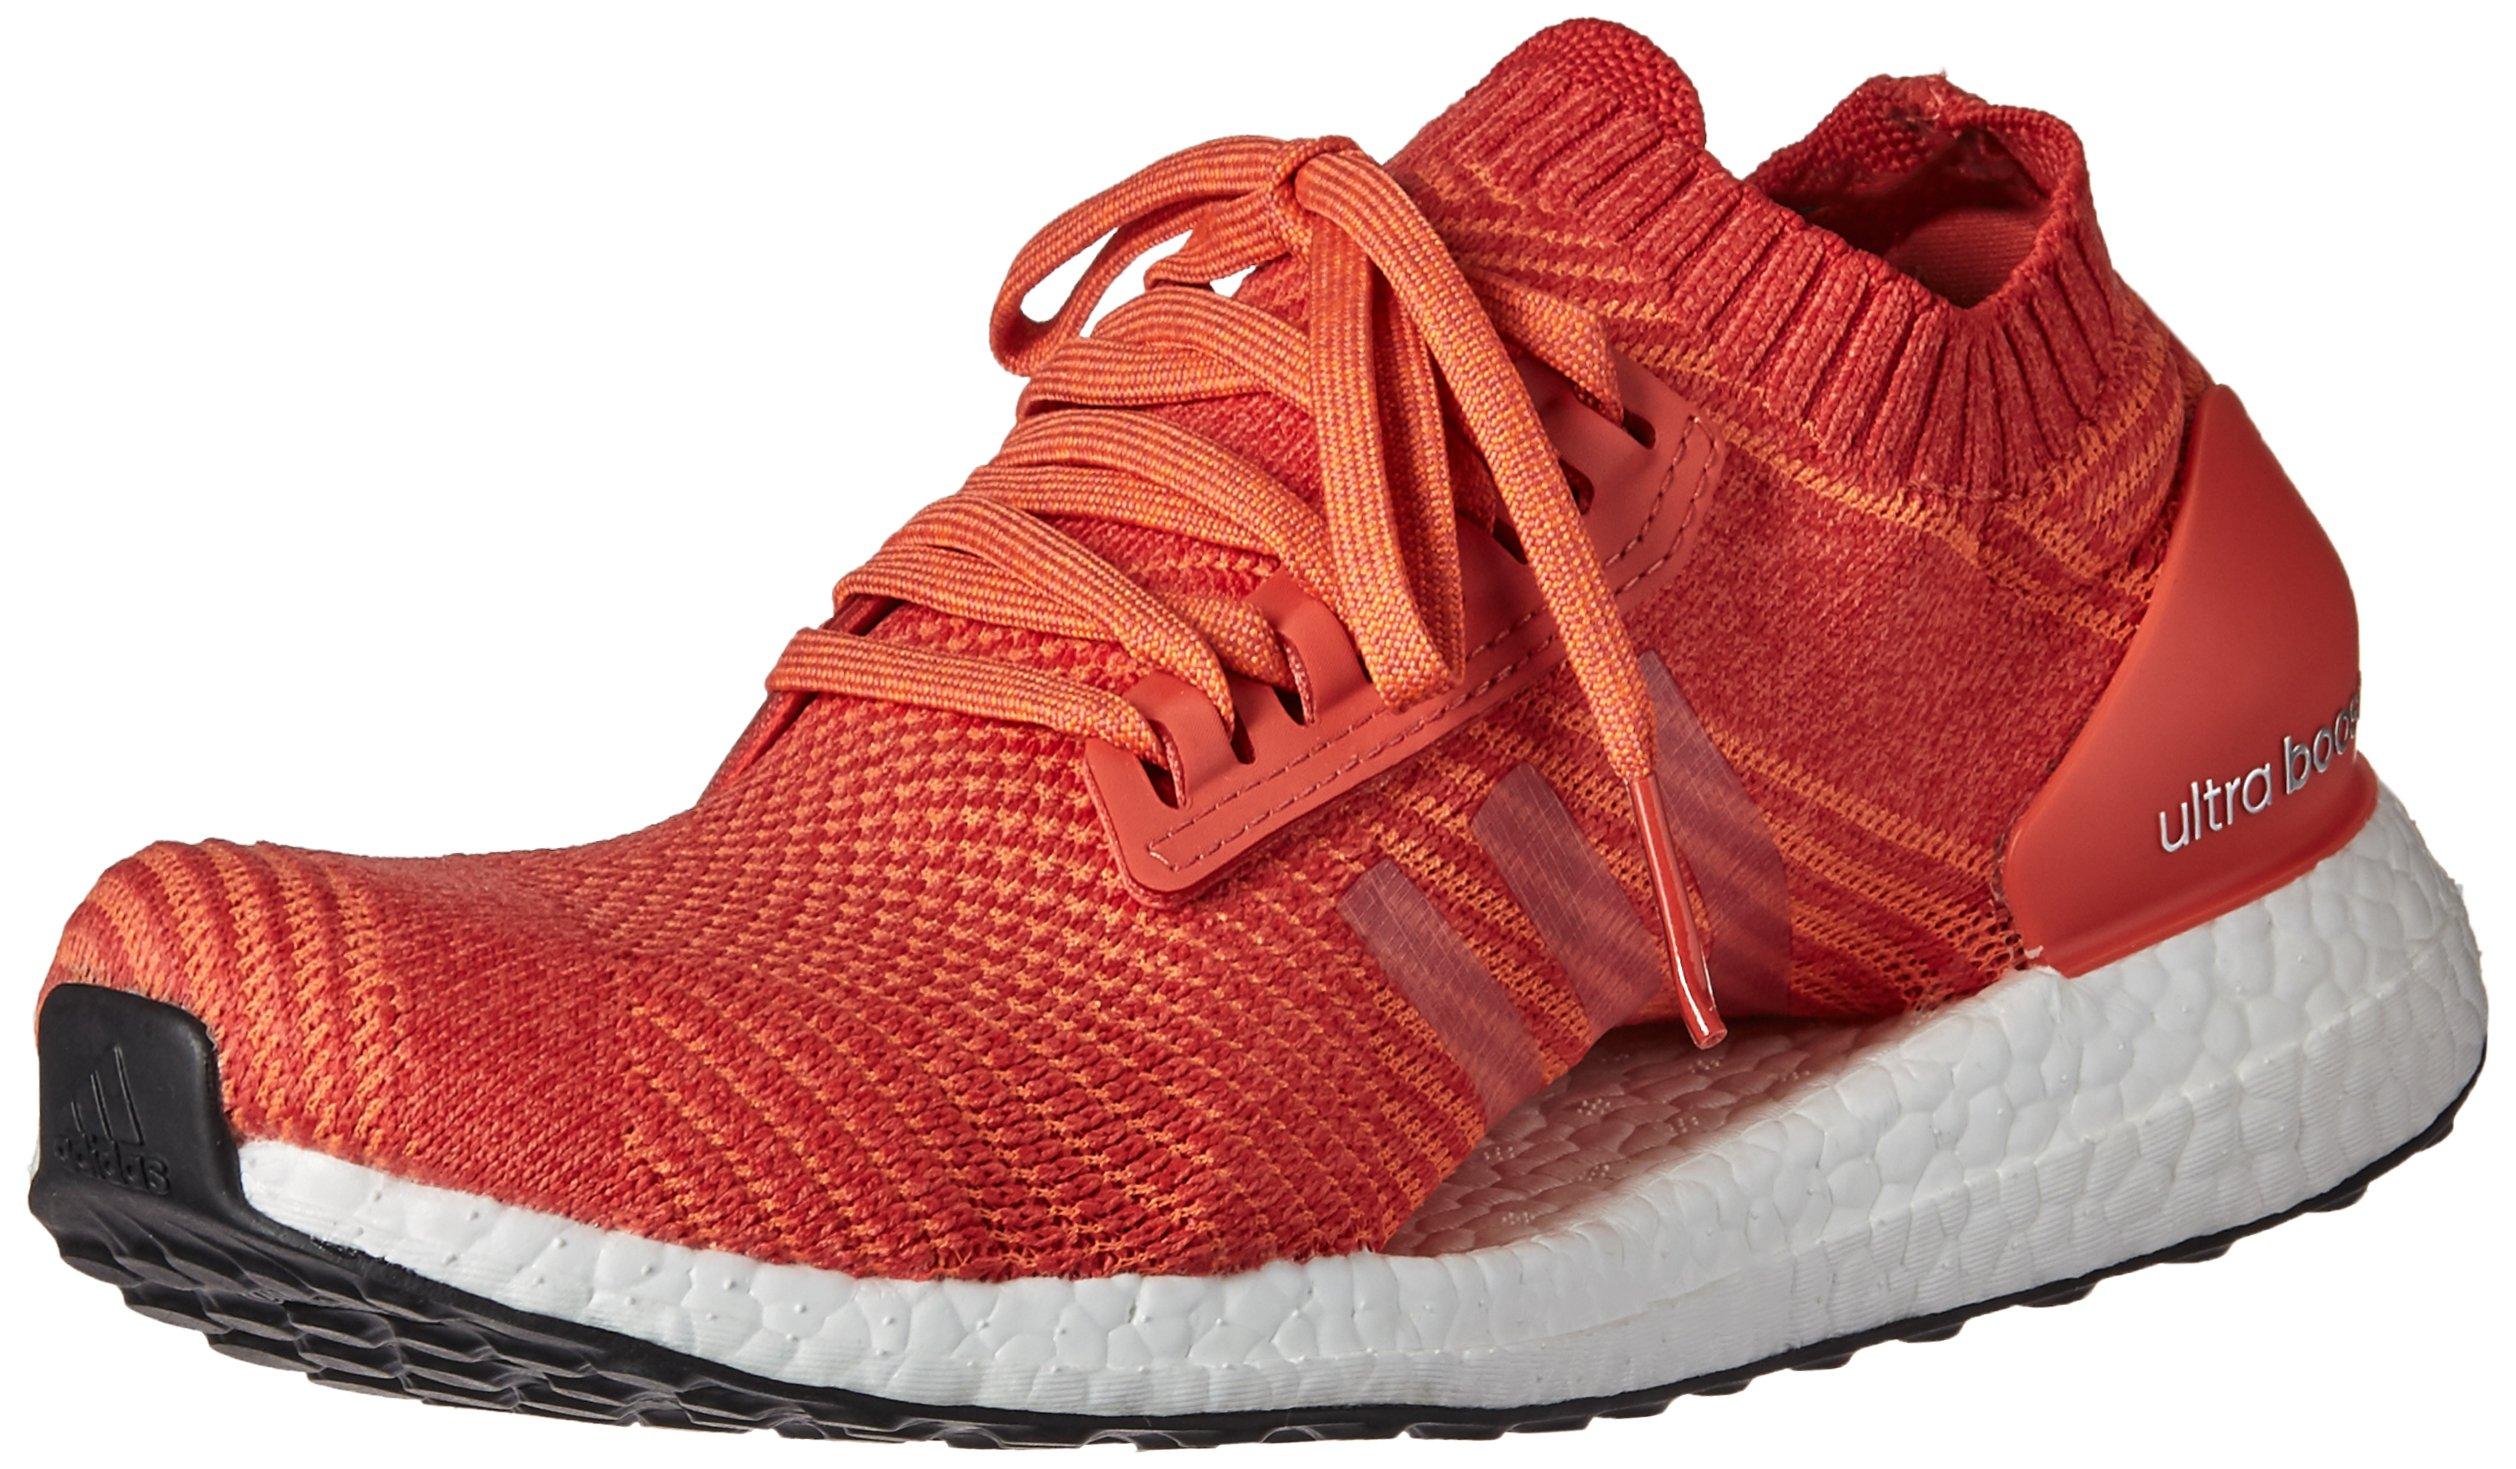 8ced38eb75543 Galleon - Adidas Originals Women s Ultraboost X Running Shoe